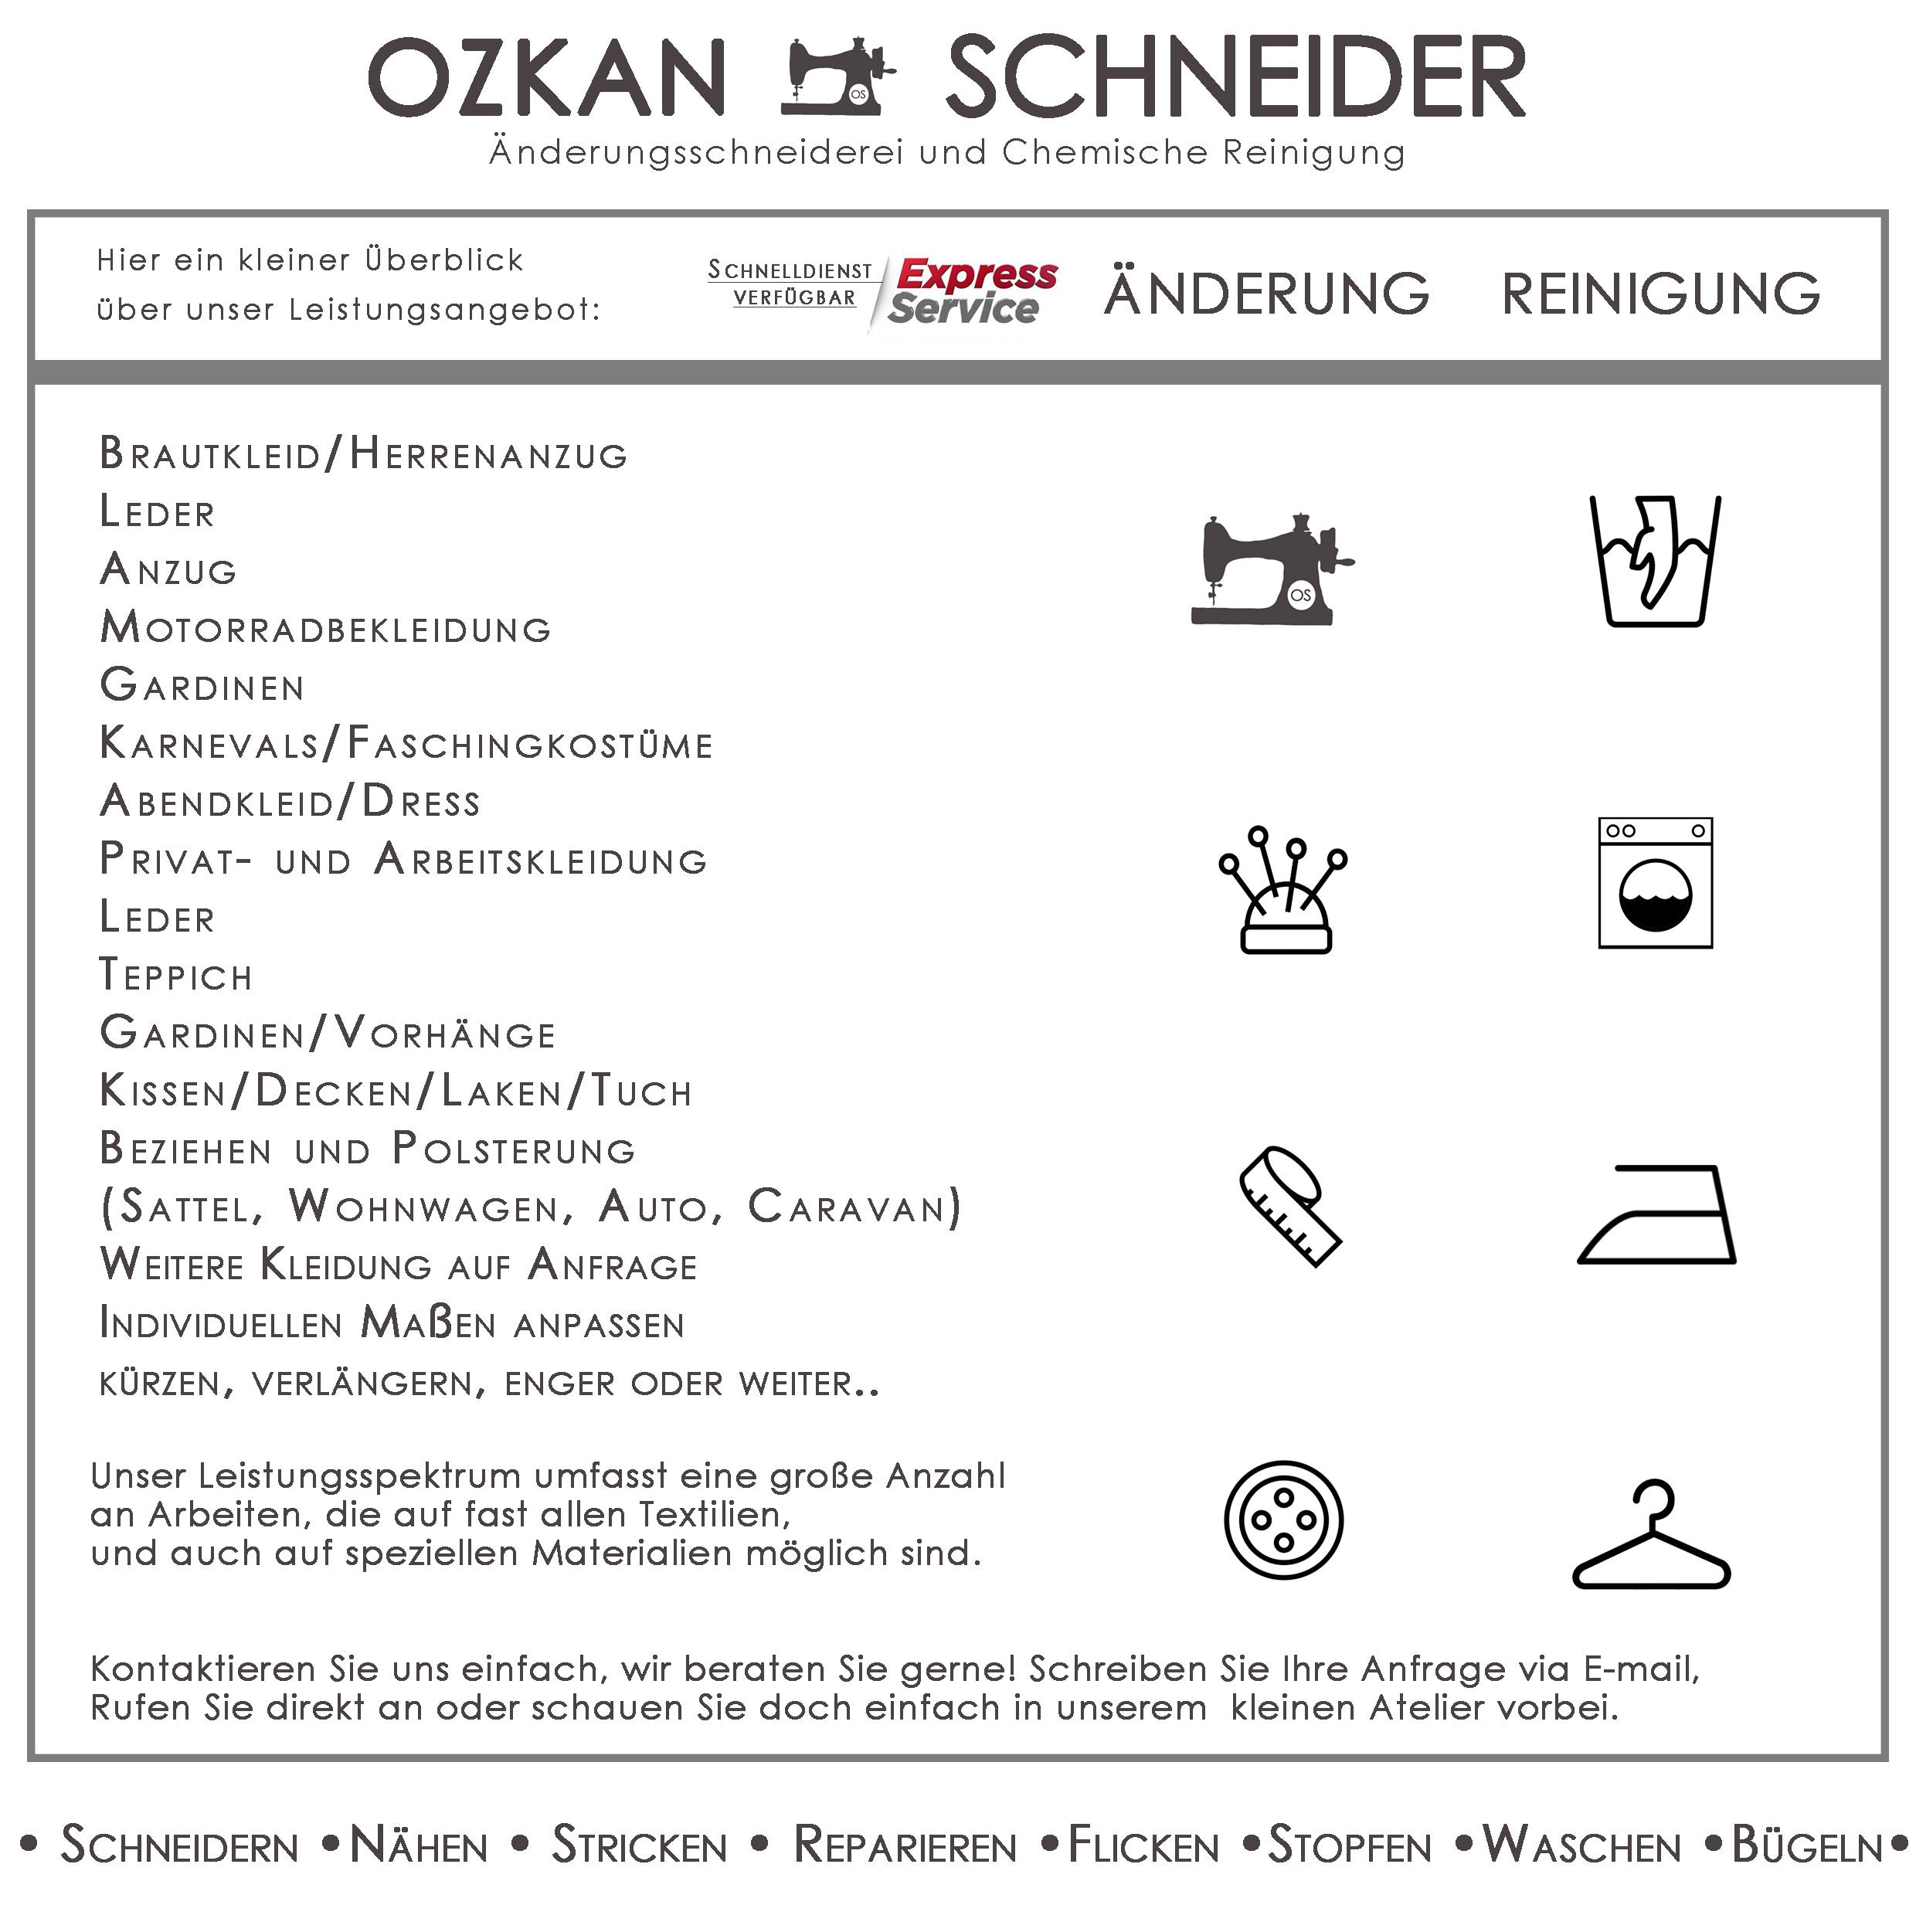 Ozkan Schneider